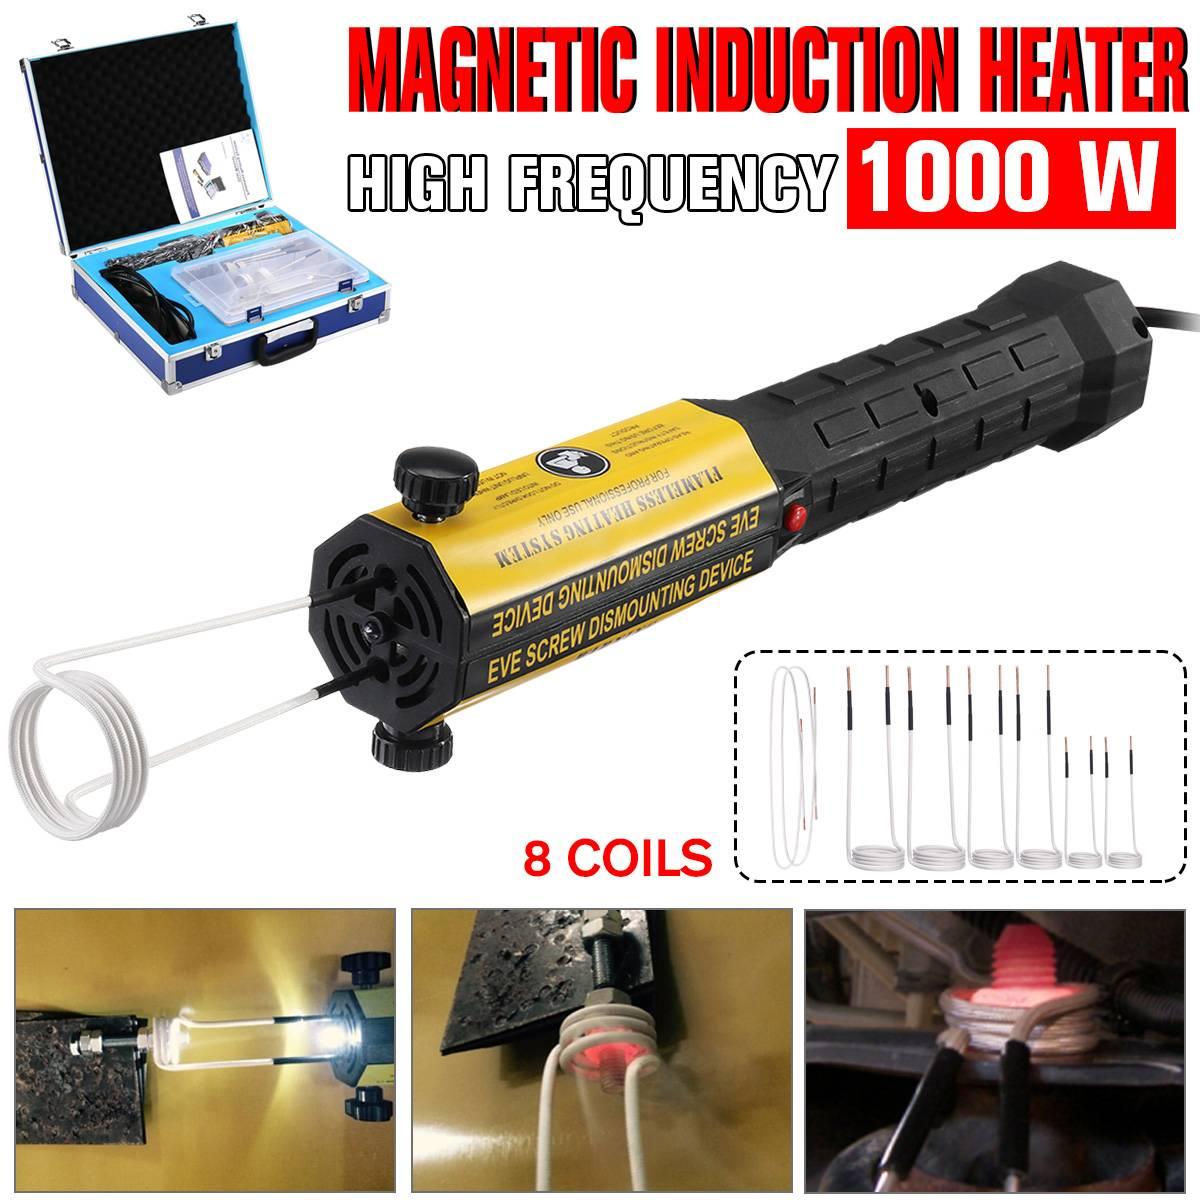 Inductie Heater 110 V/220 V 8 Coils Bolt Warmte Remover Tool Kit Vlamloze Magnetische Inductie Heater Auto Demontage reparatie Tool